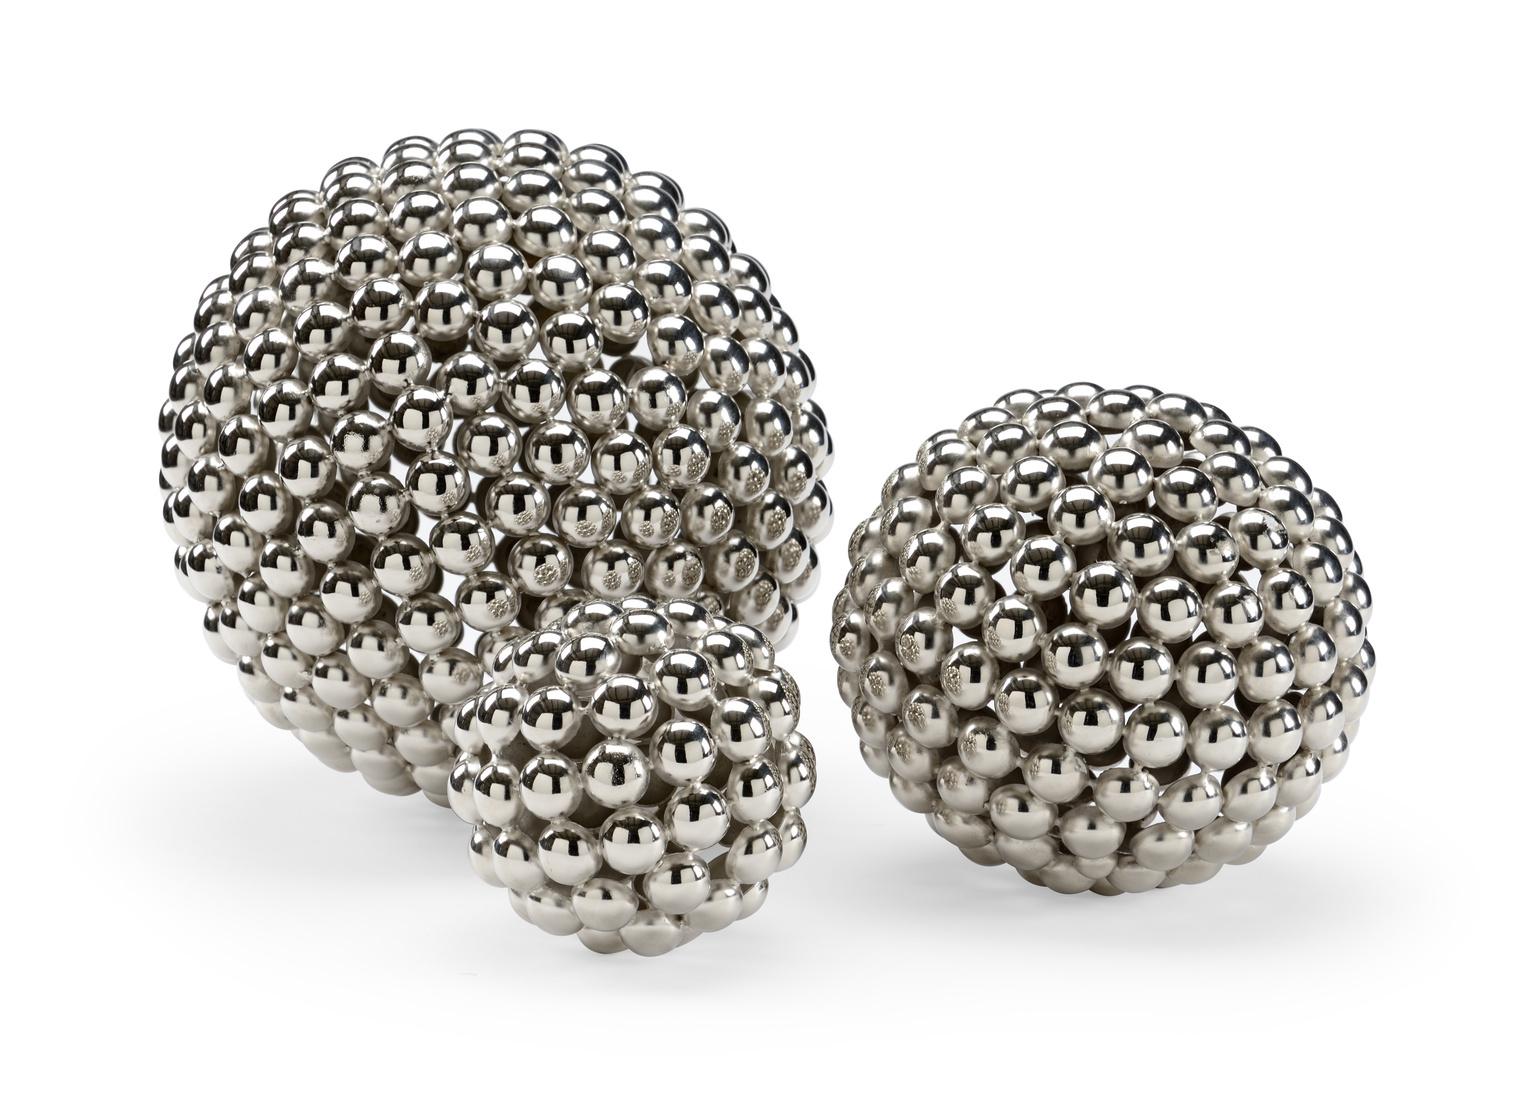 Ball Spheres (3)